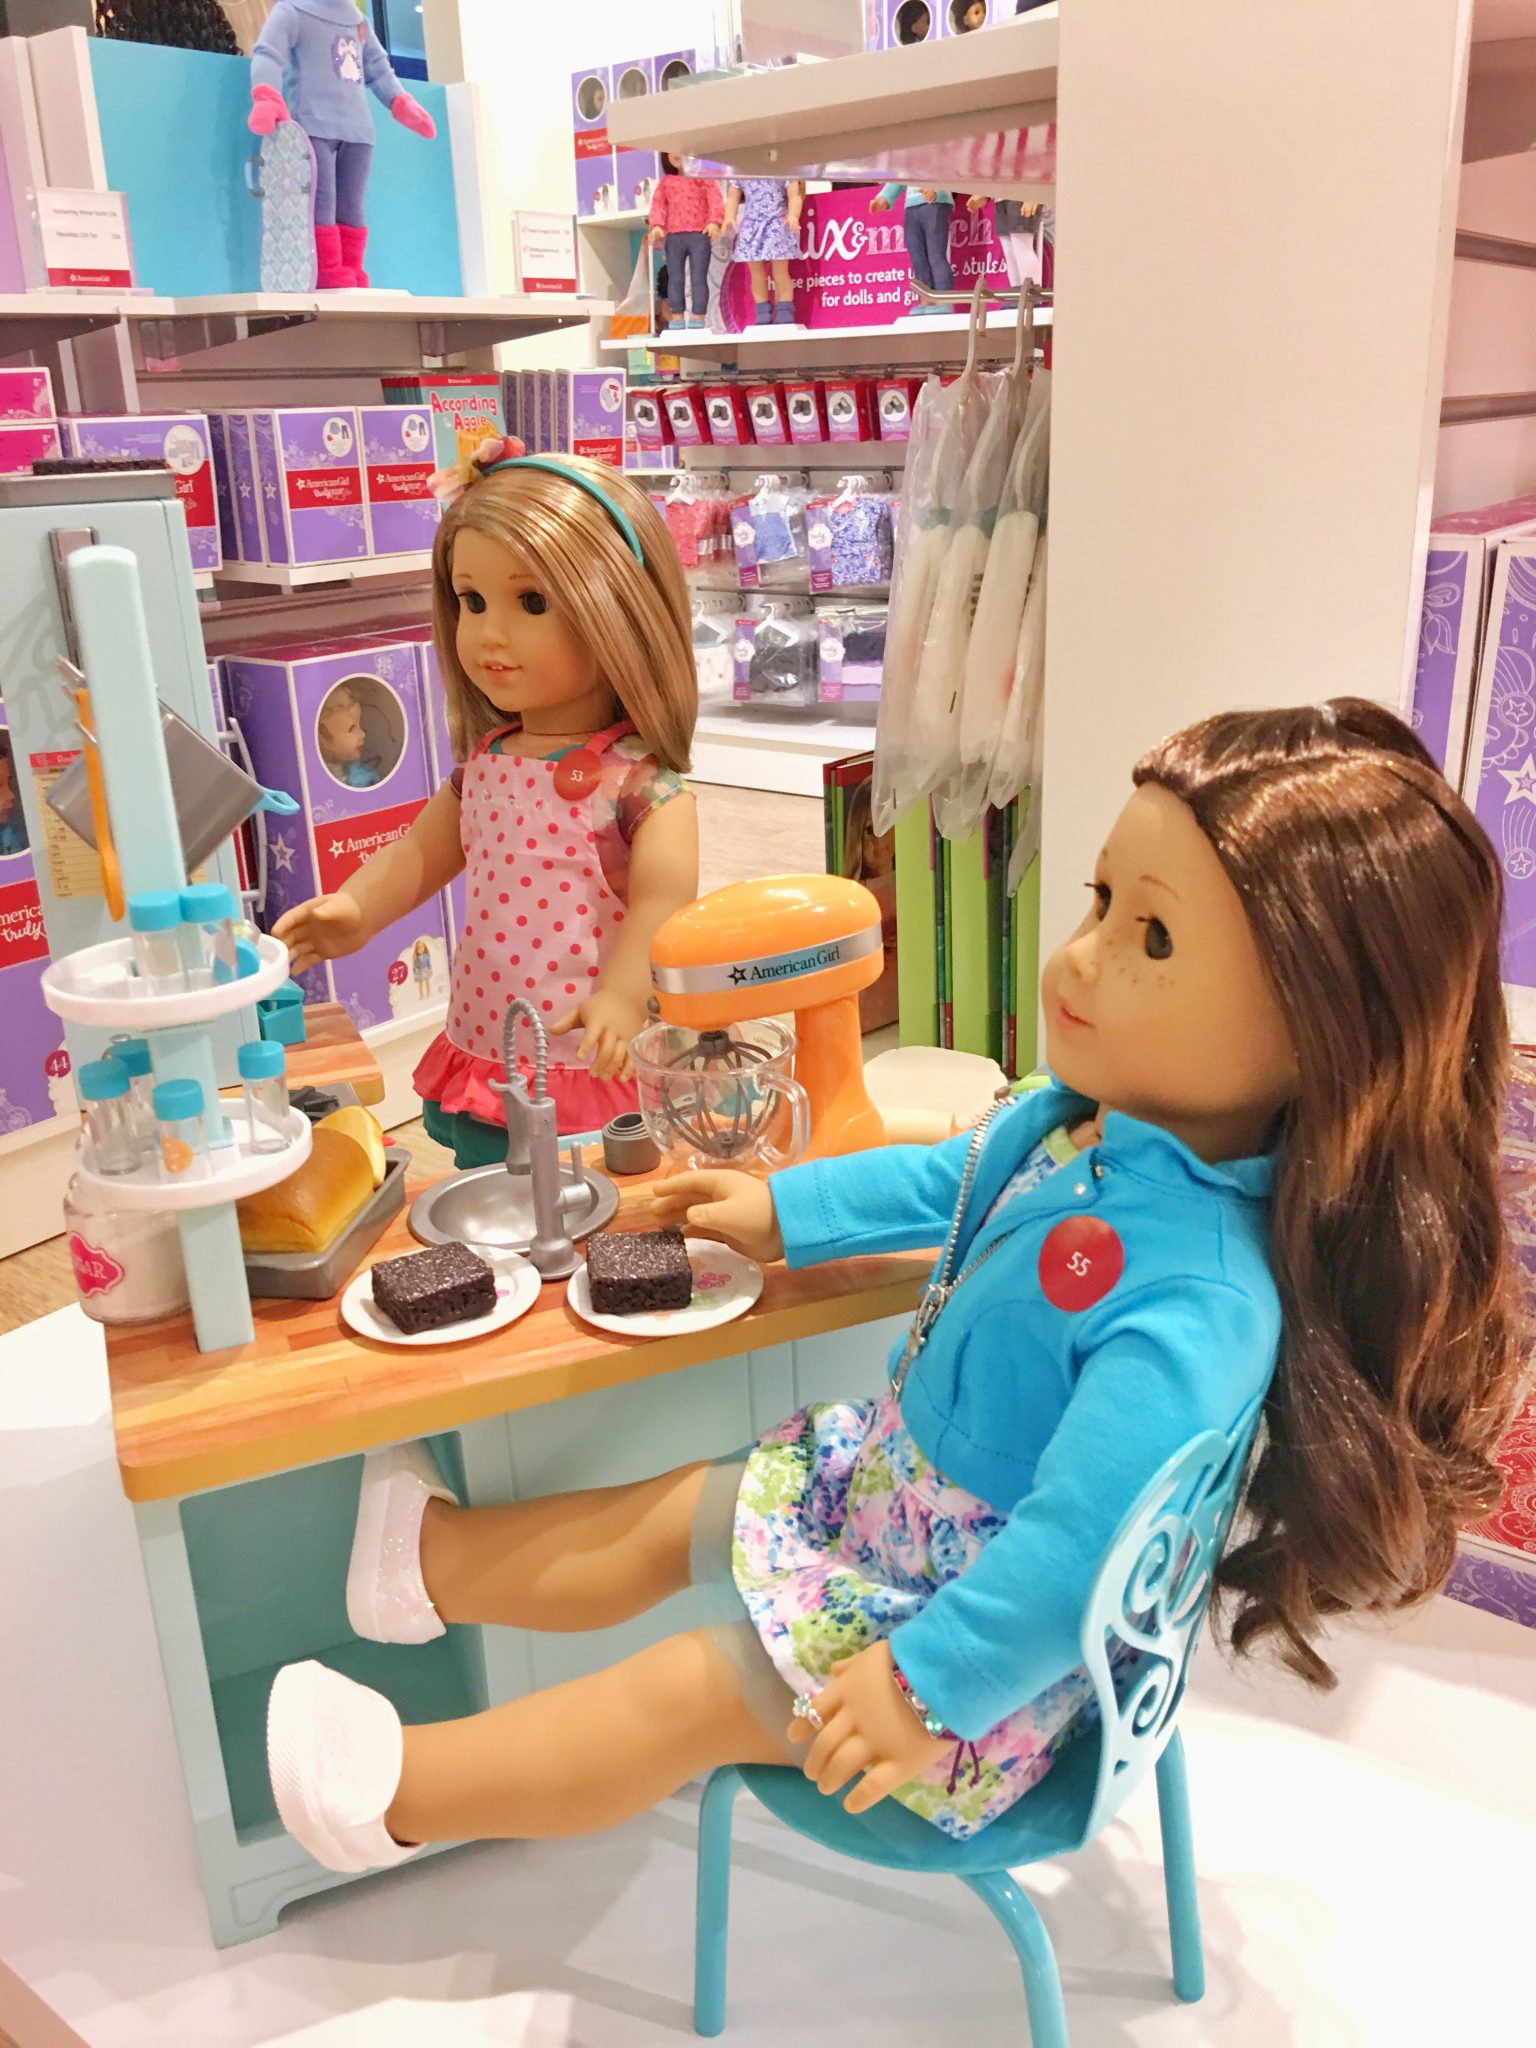 kitchen set for girl diy island on wheels baking american at washington square mall